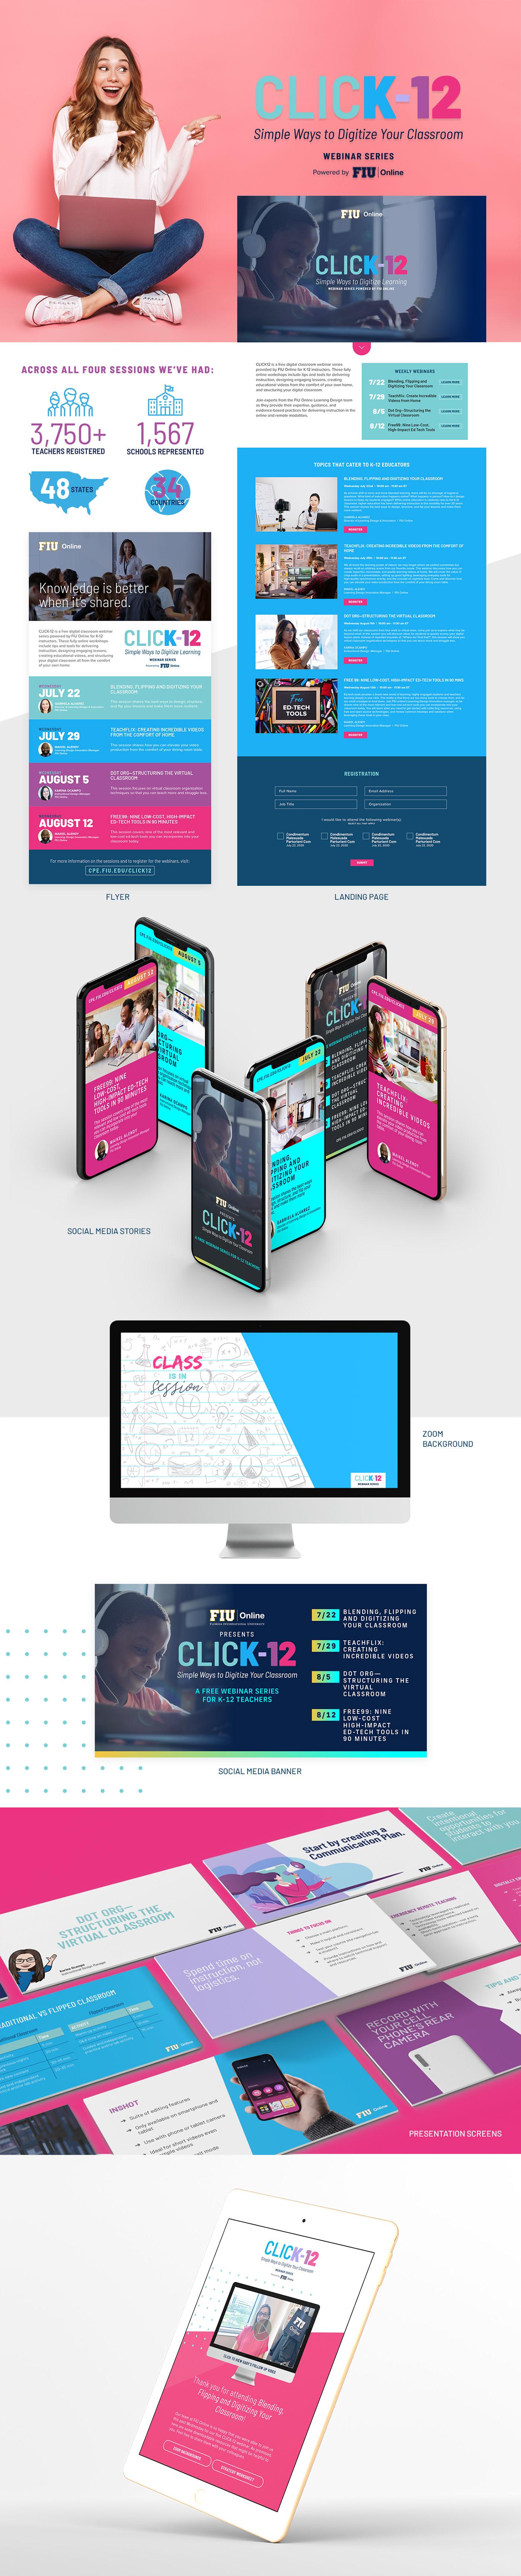 Education graphic design  infographics k-12 presentation Social Media Graphics teachers webinar Website zoom